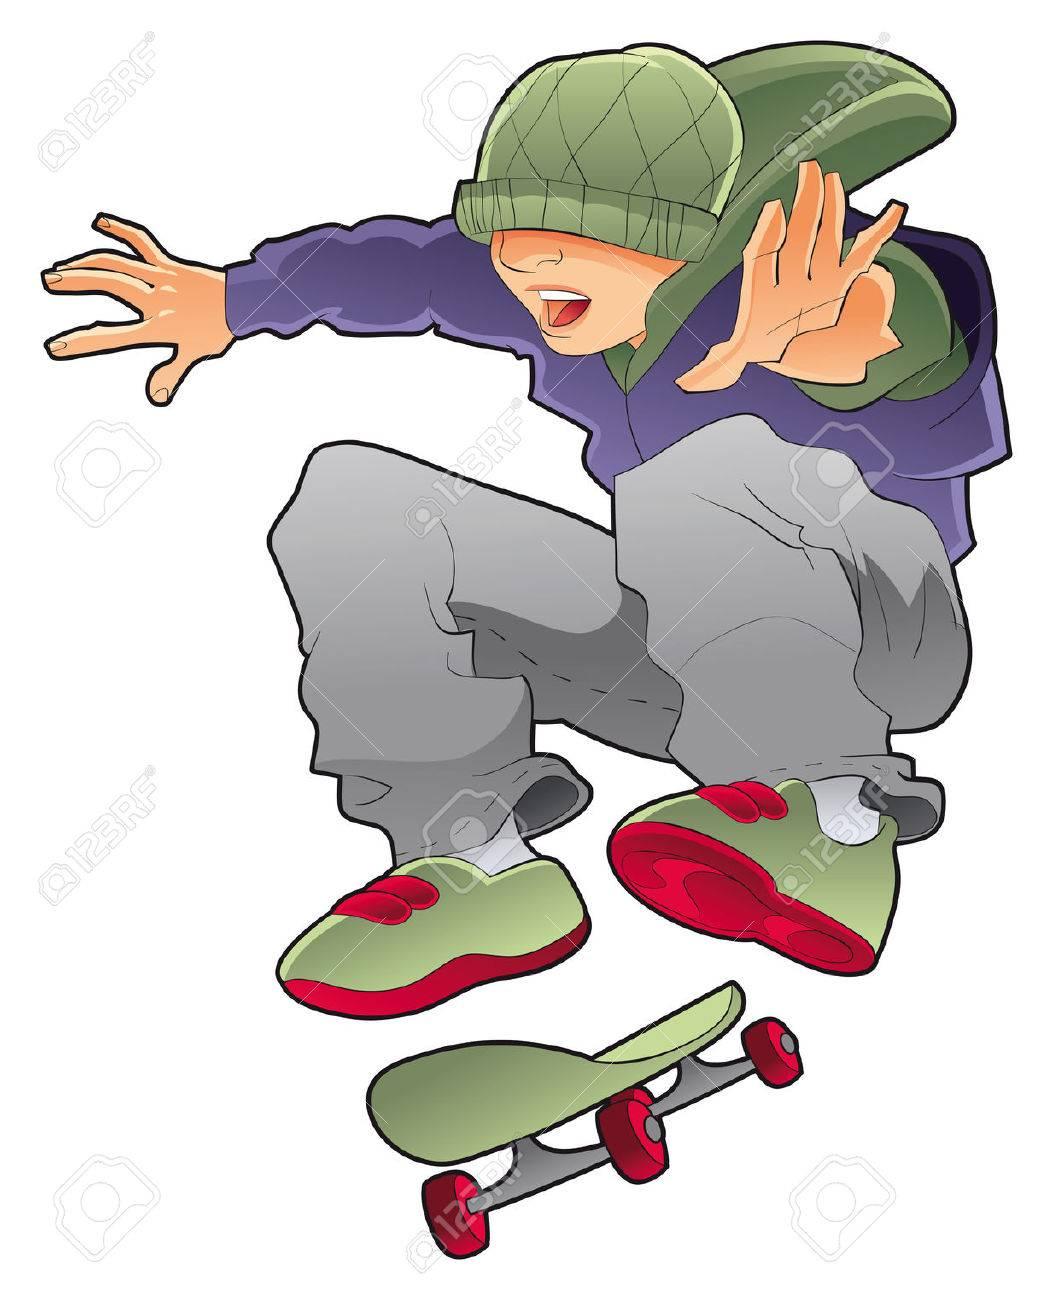 Skateboard clip art images skateboard stock photos amp clipart - Hip Hop Kids Skater Boy Vector Character